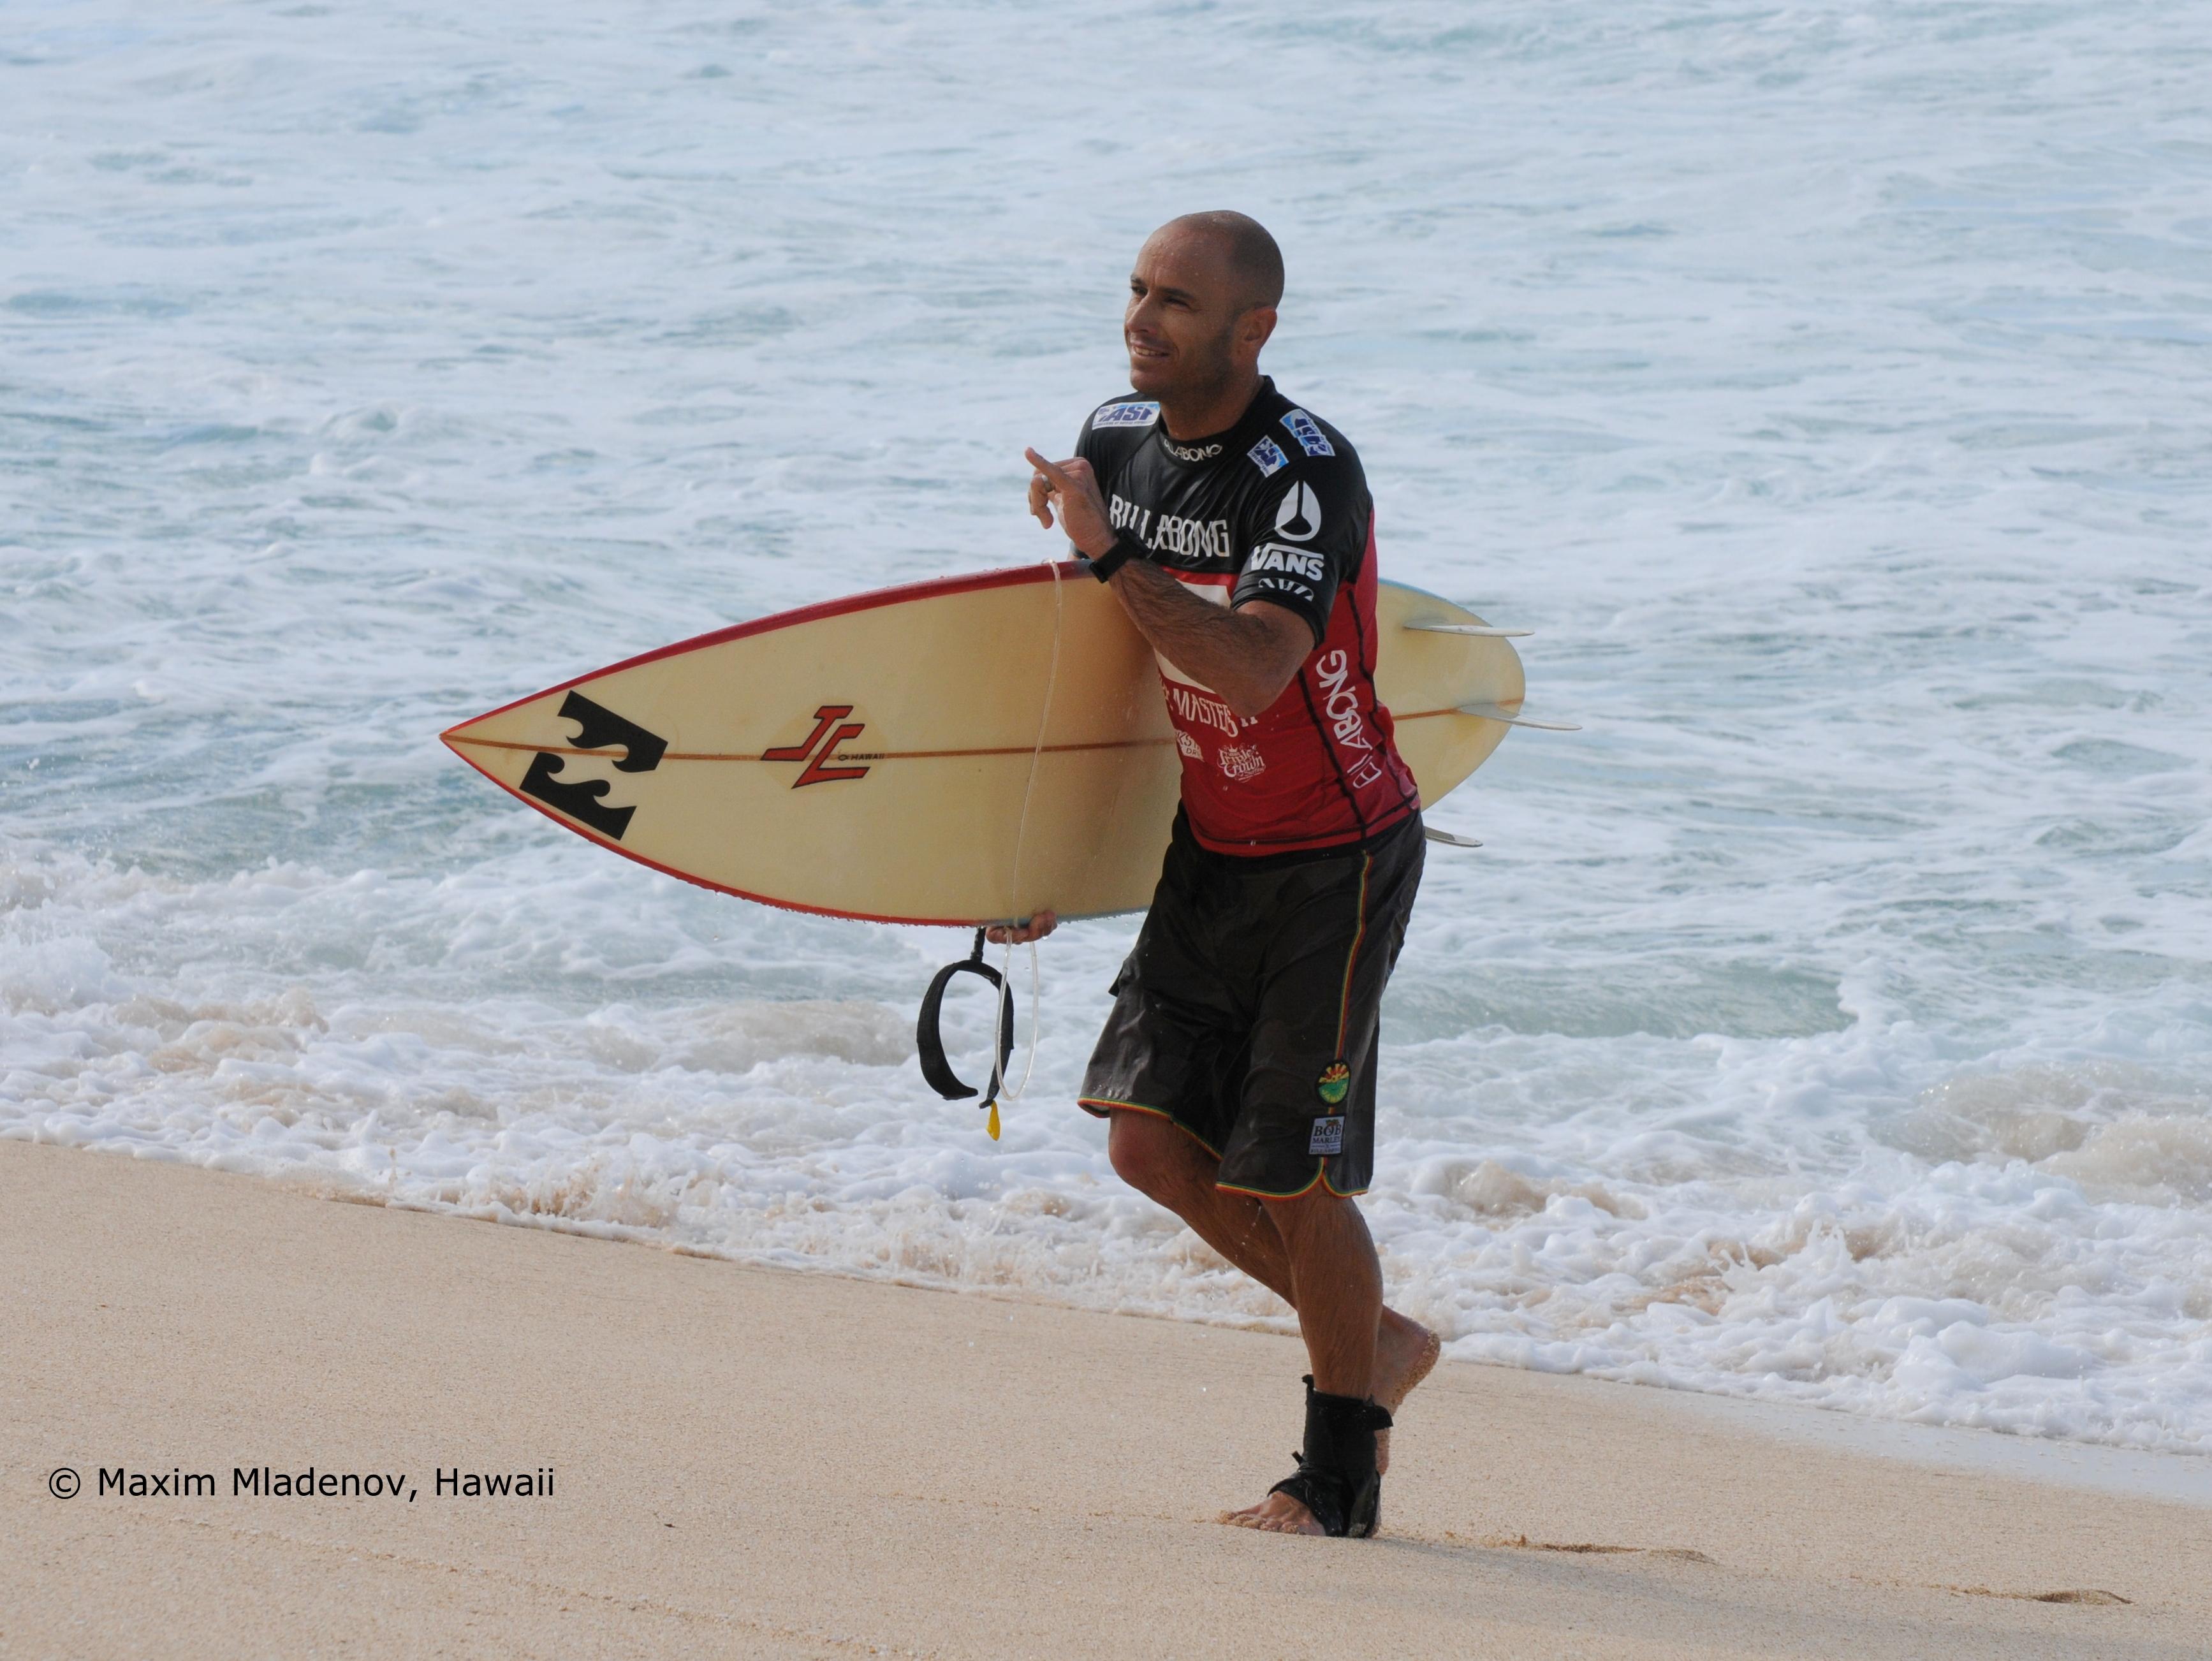 Shane Dorian - 1er Tour 08-12-2011 Billabong PIPE Masters © Maxim Mladenov, Hawaii